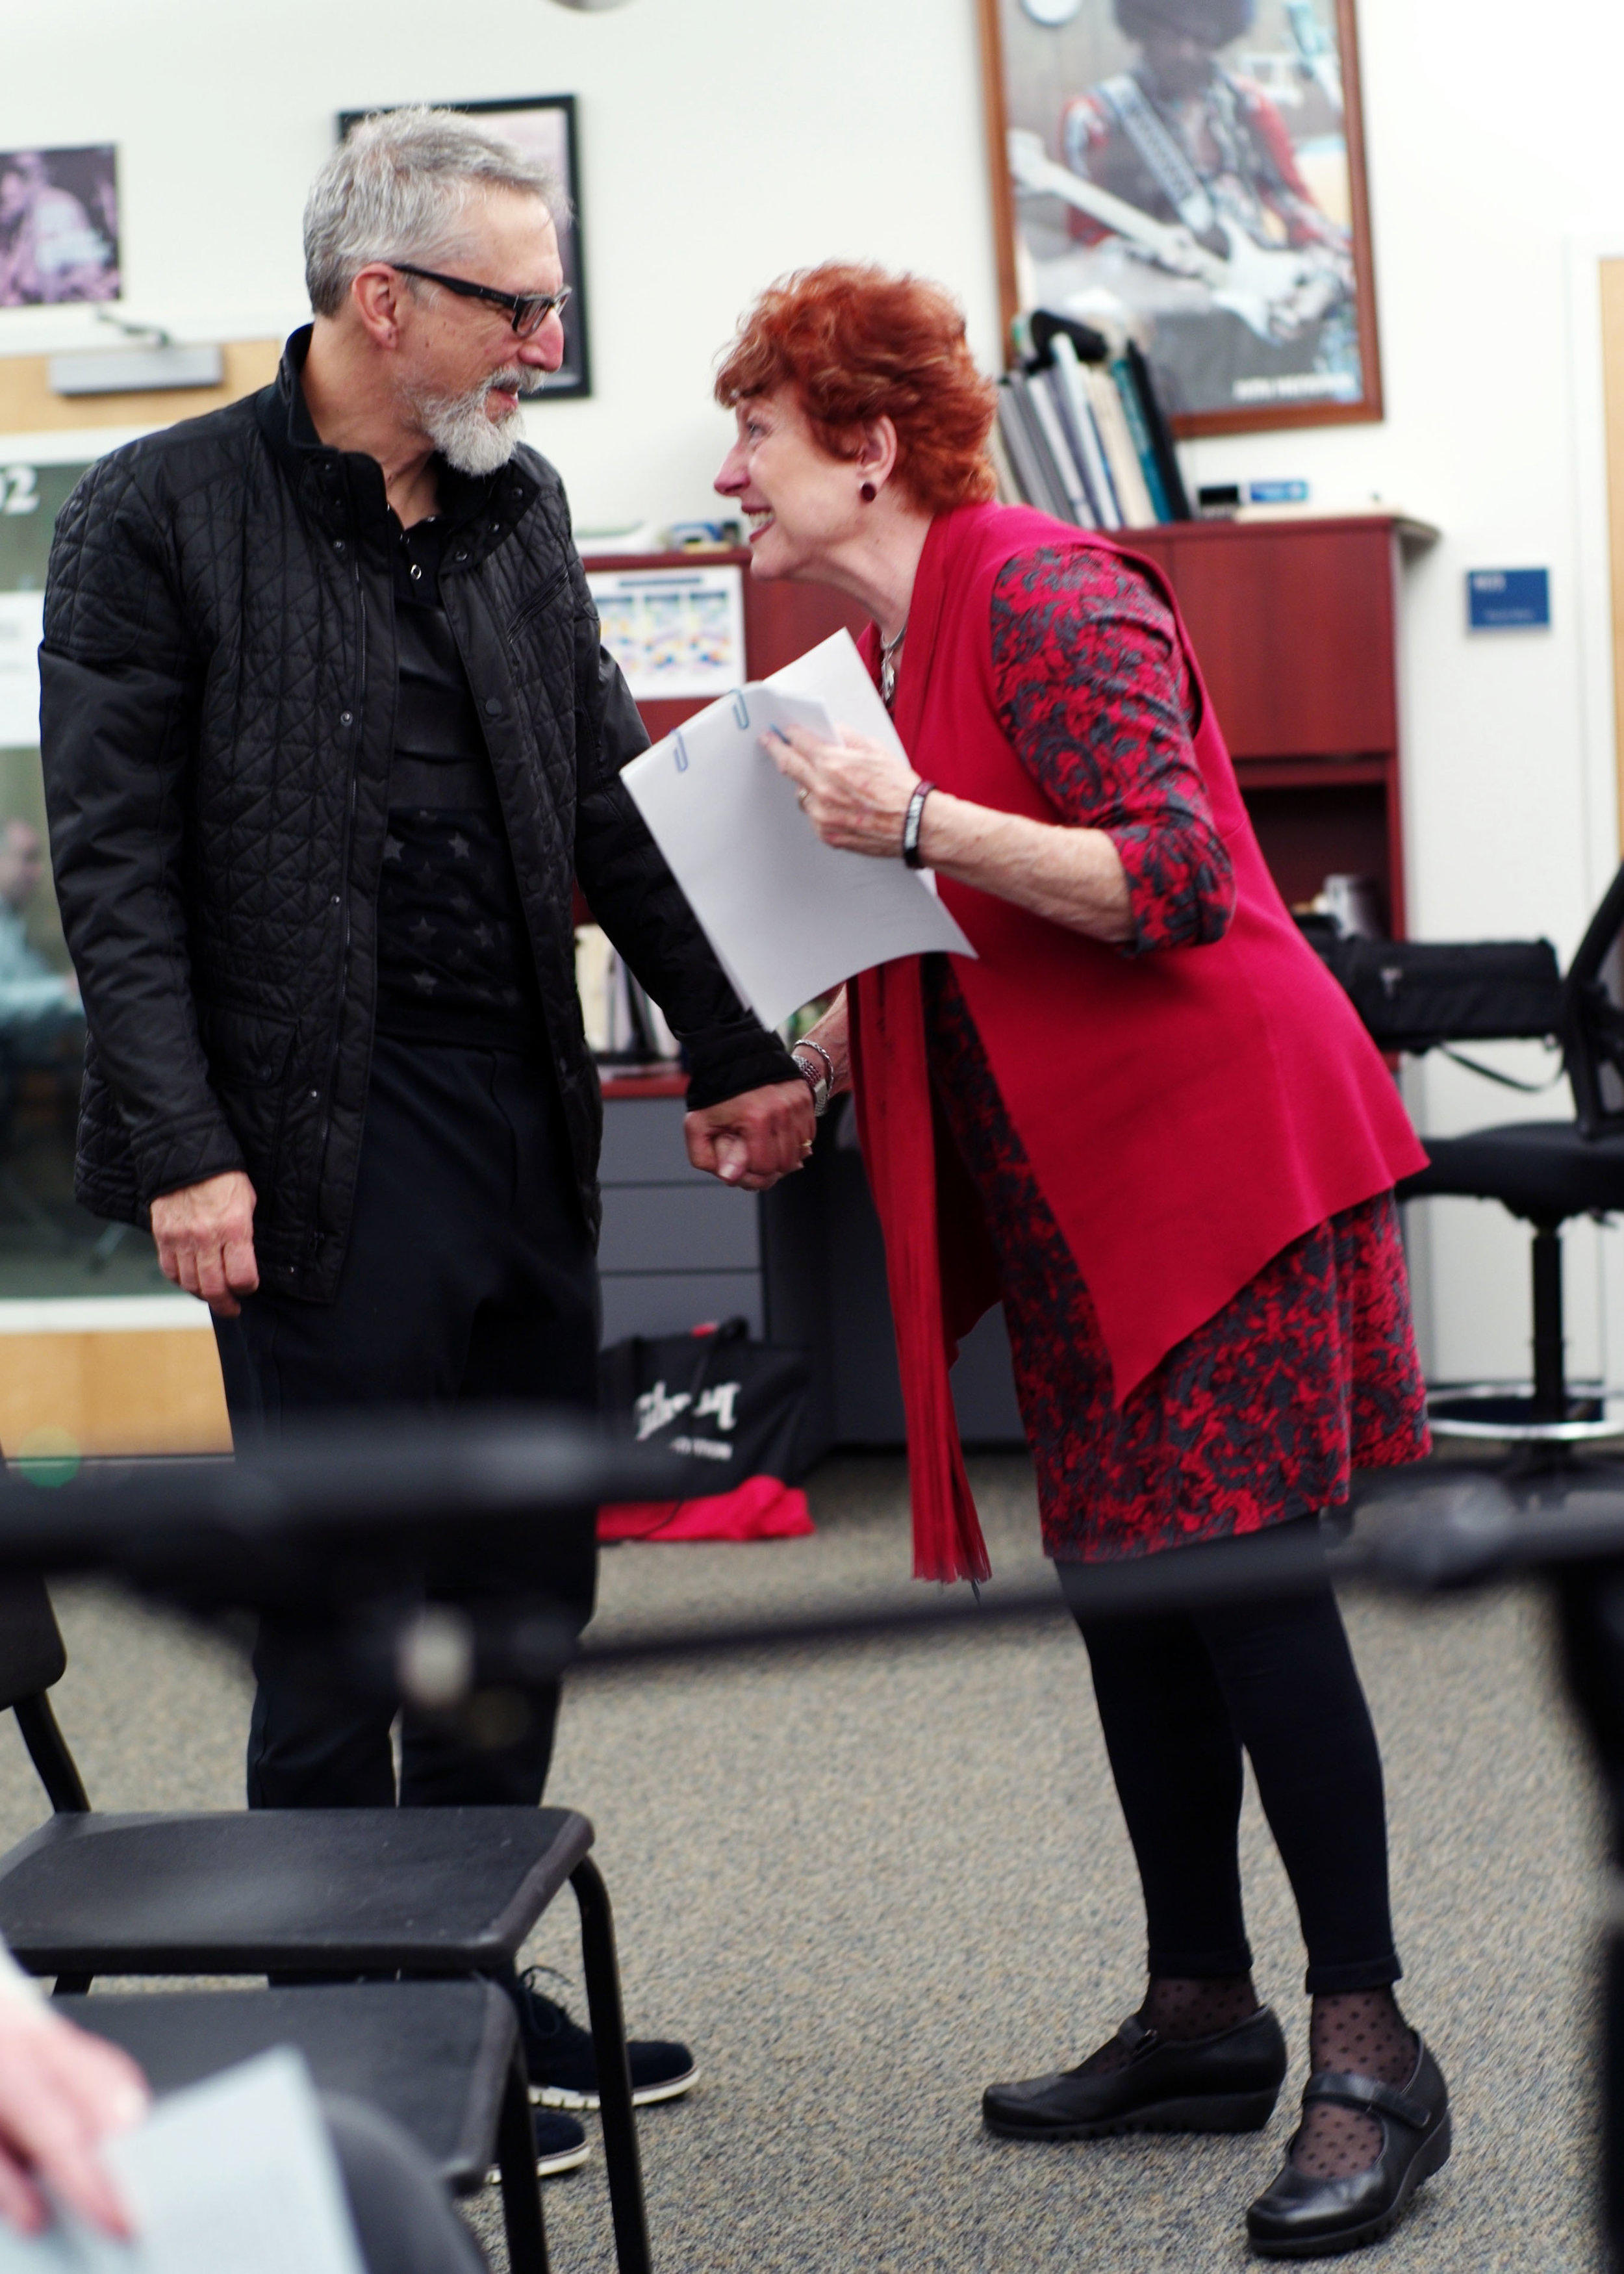 Paul F and Carol